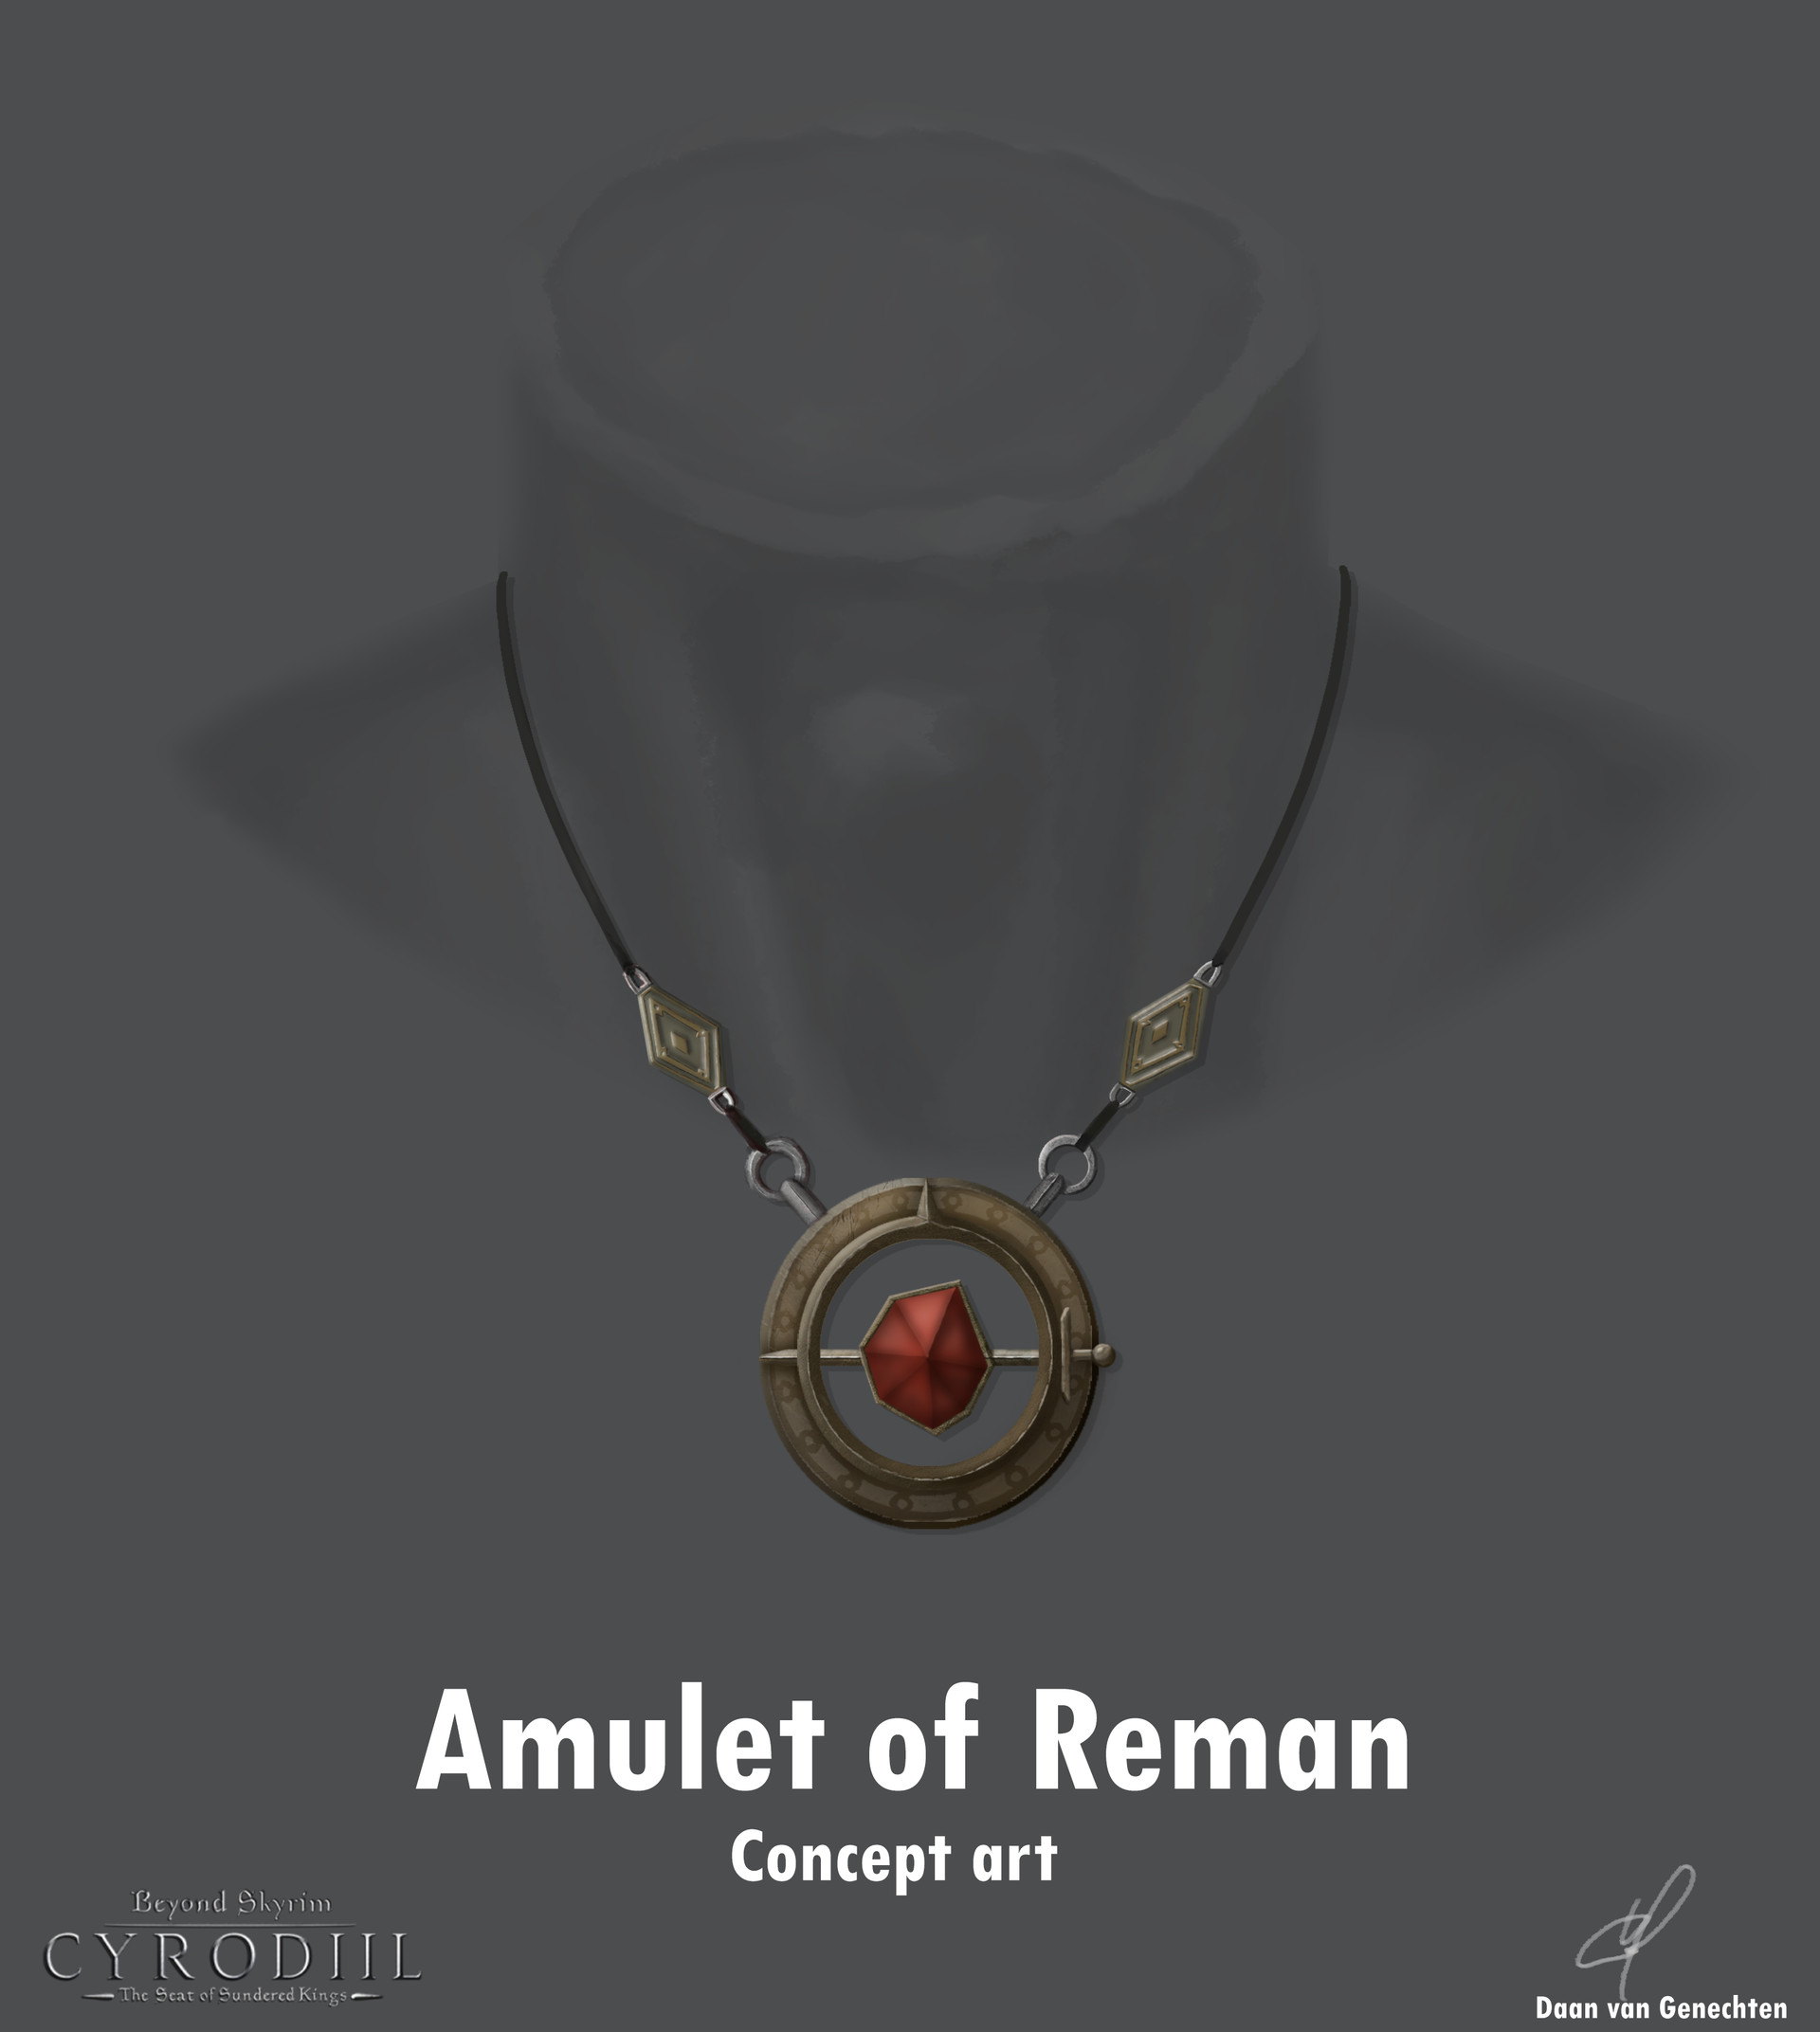 ArtStation - The amulet of Reman, Daan -